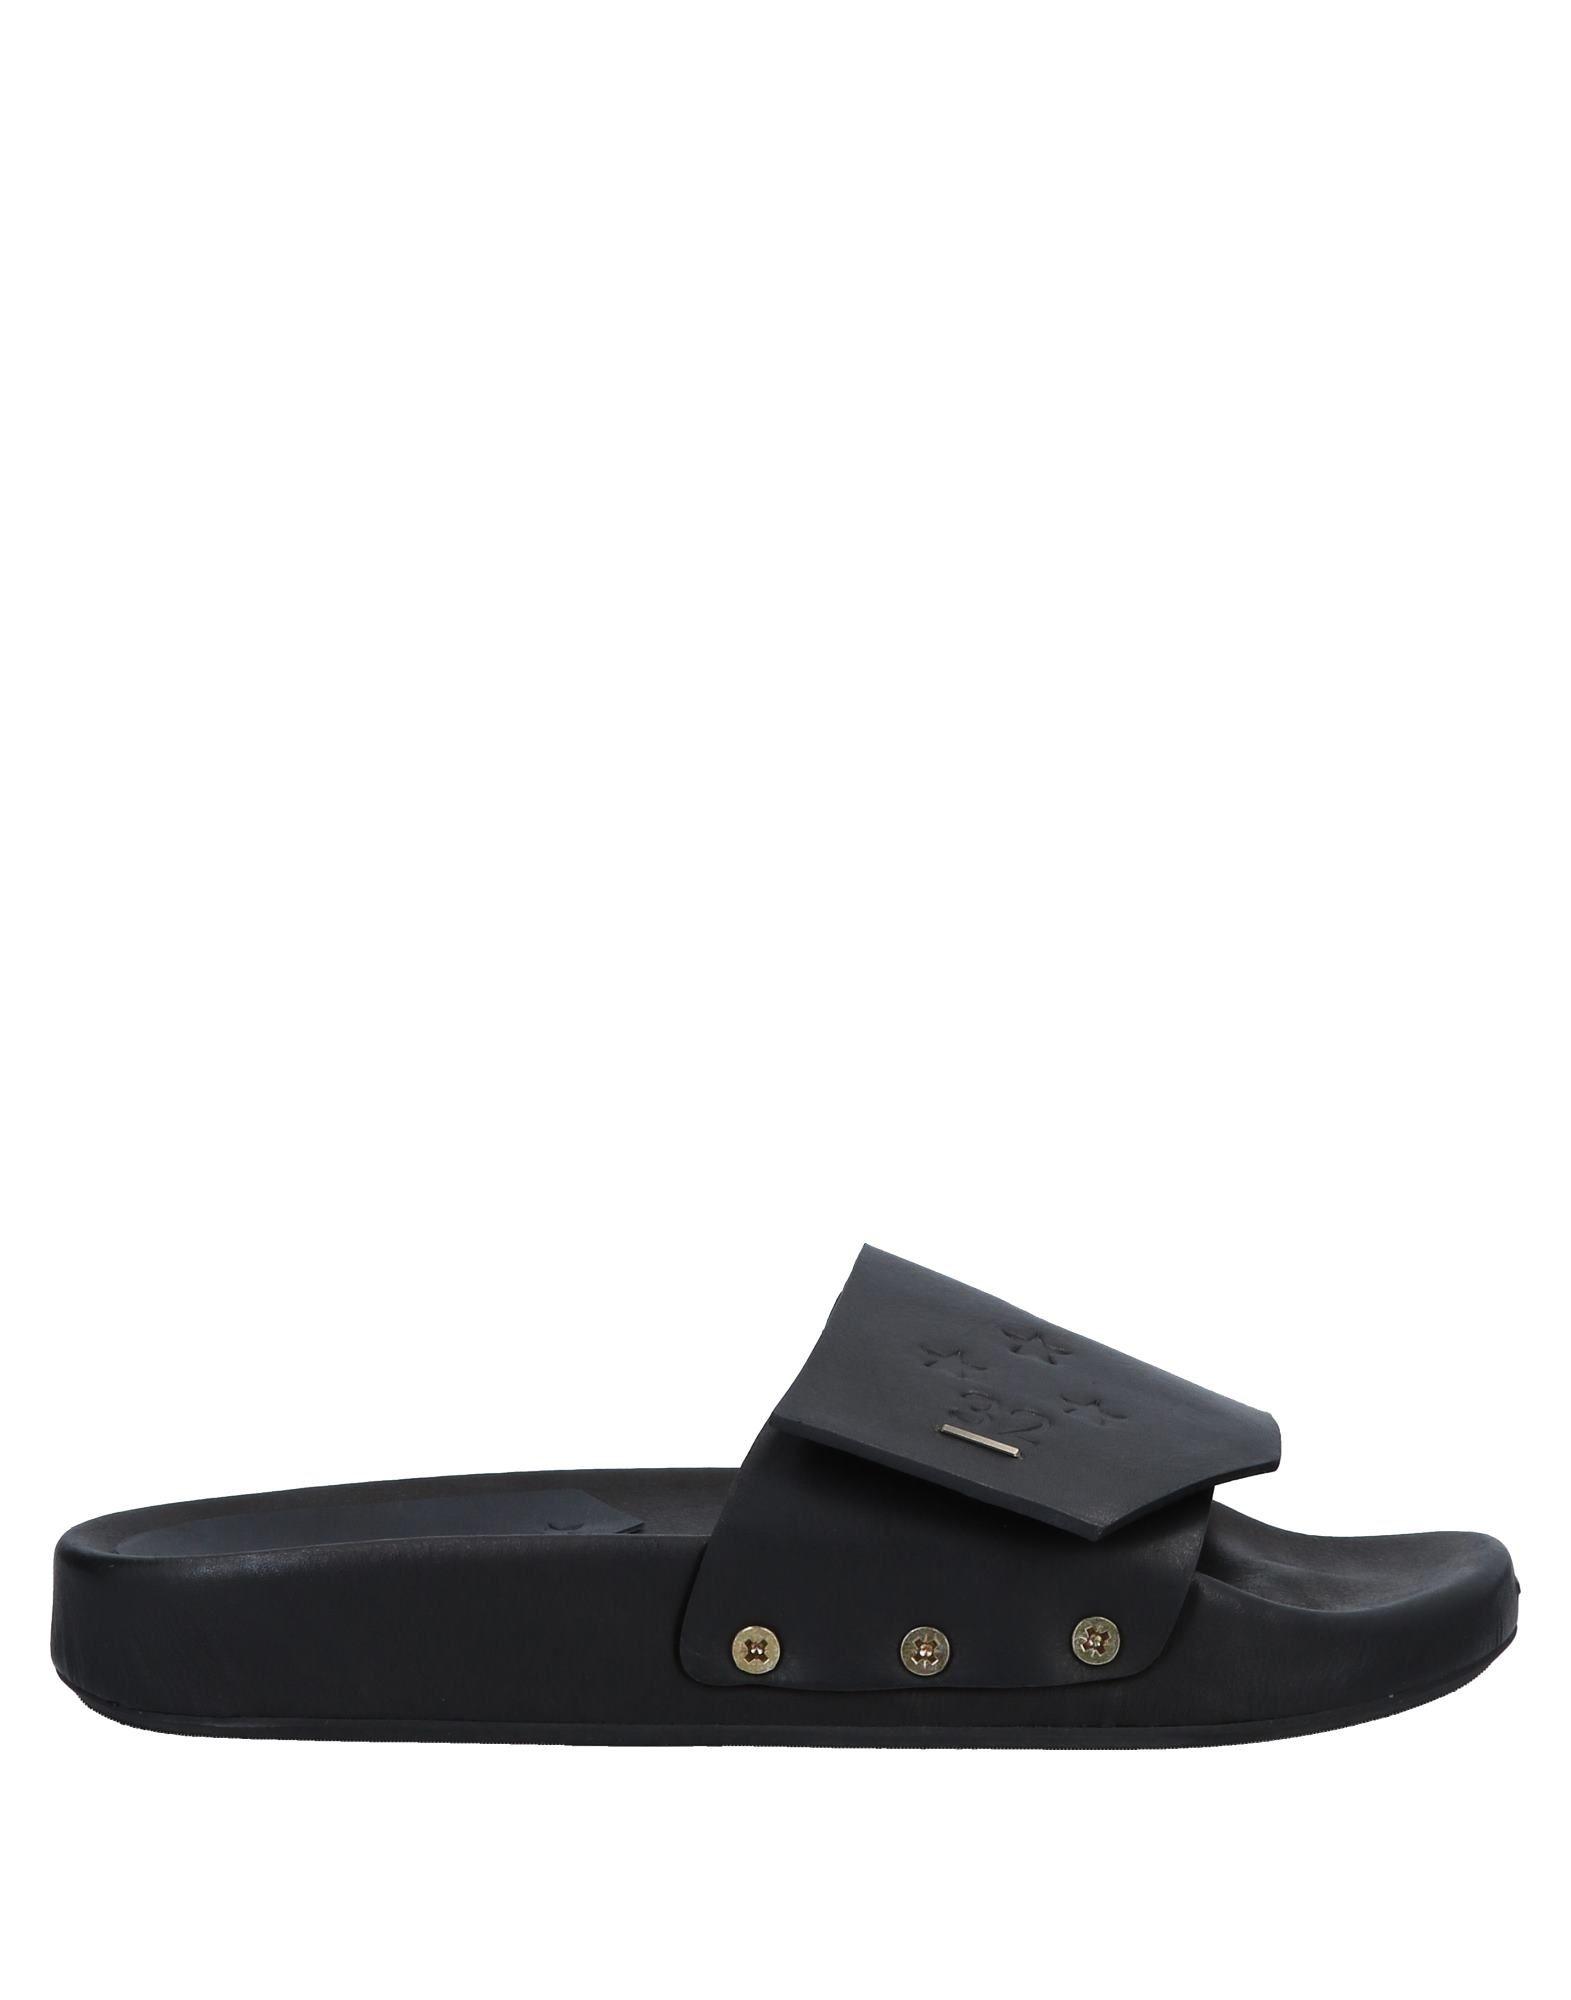 artselab sandales - hommes artselab ligne 11564655bv sandales en ligne artselab le royaume - uni - 7dc994